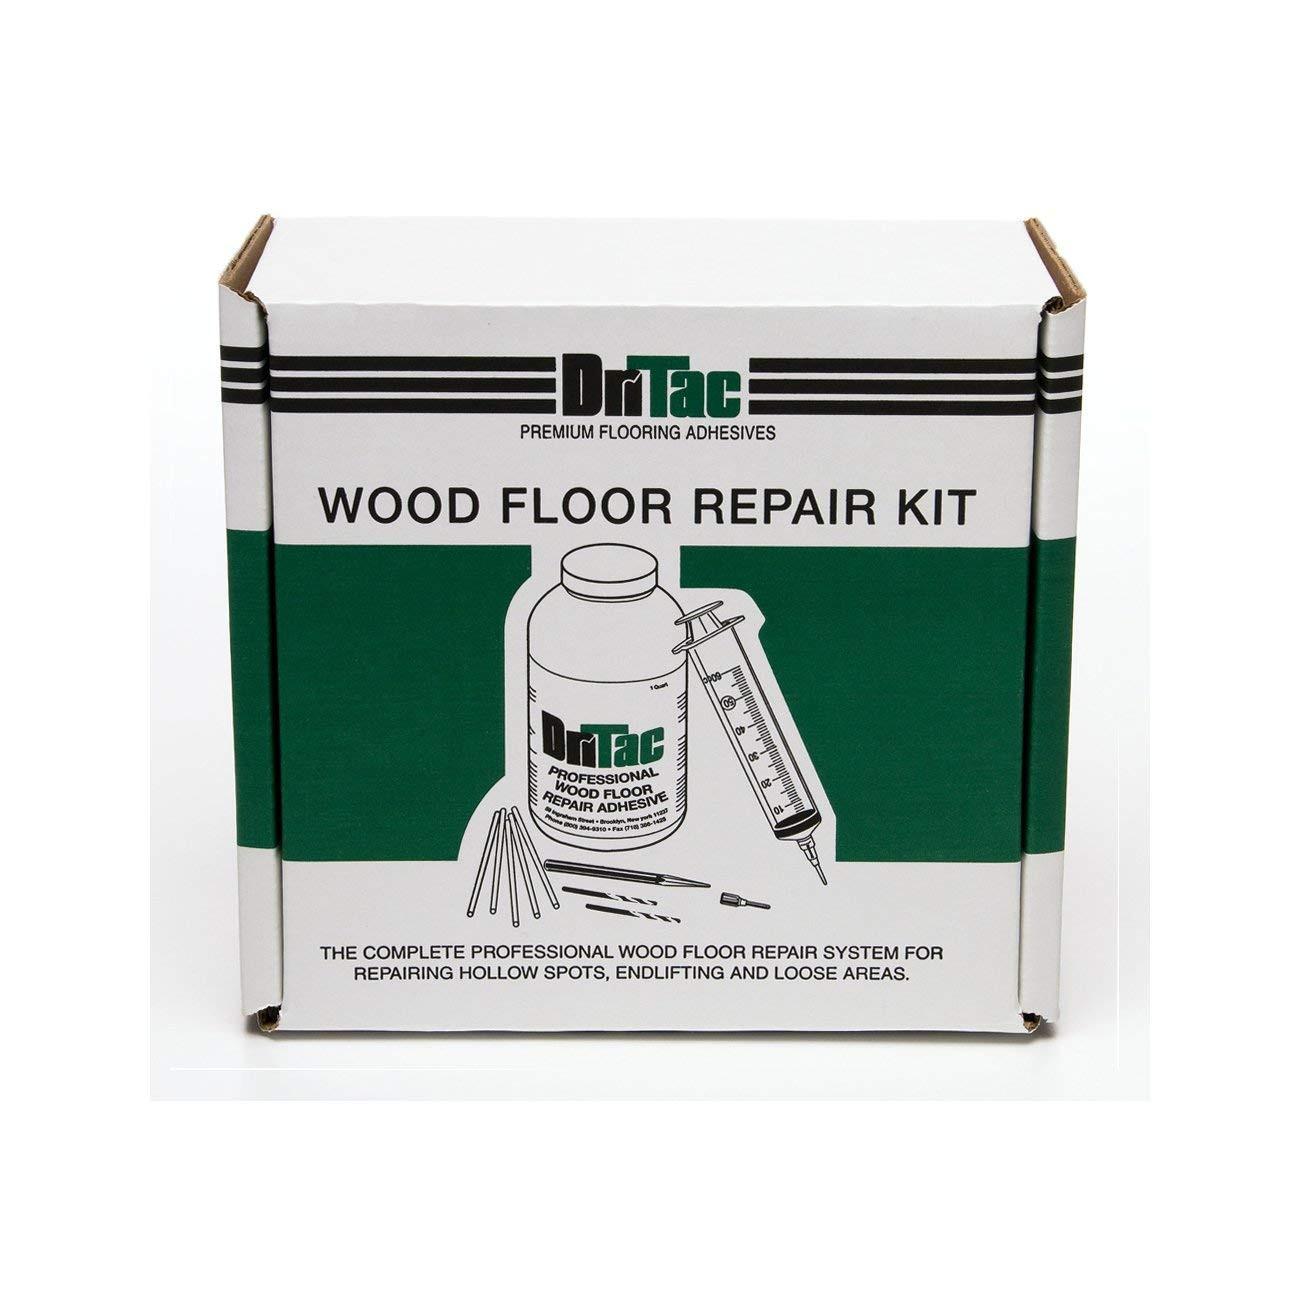 Parquet Floor Gap Filler Singapore: 13 Unique Hardwood Floor Gap Filler Products